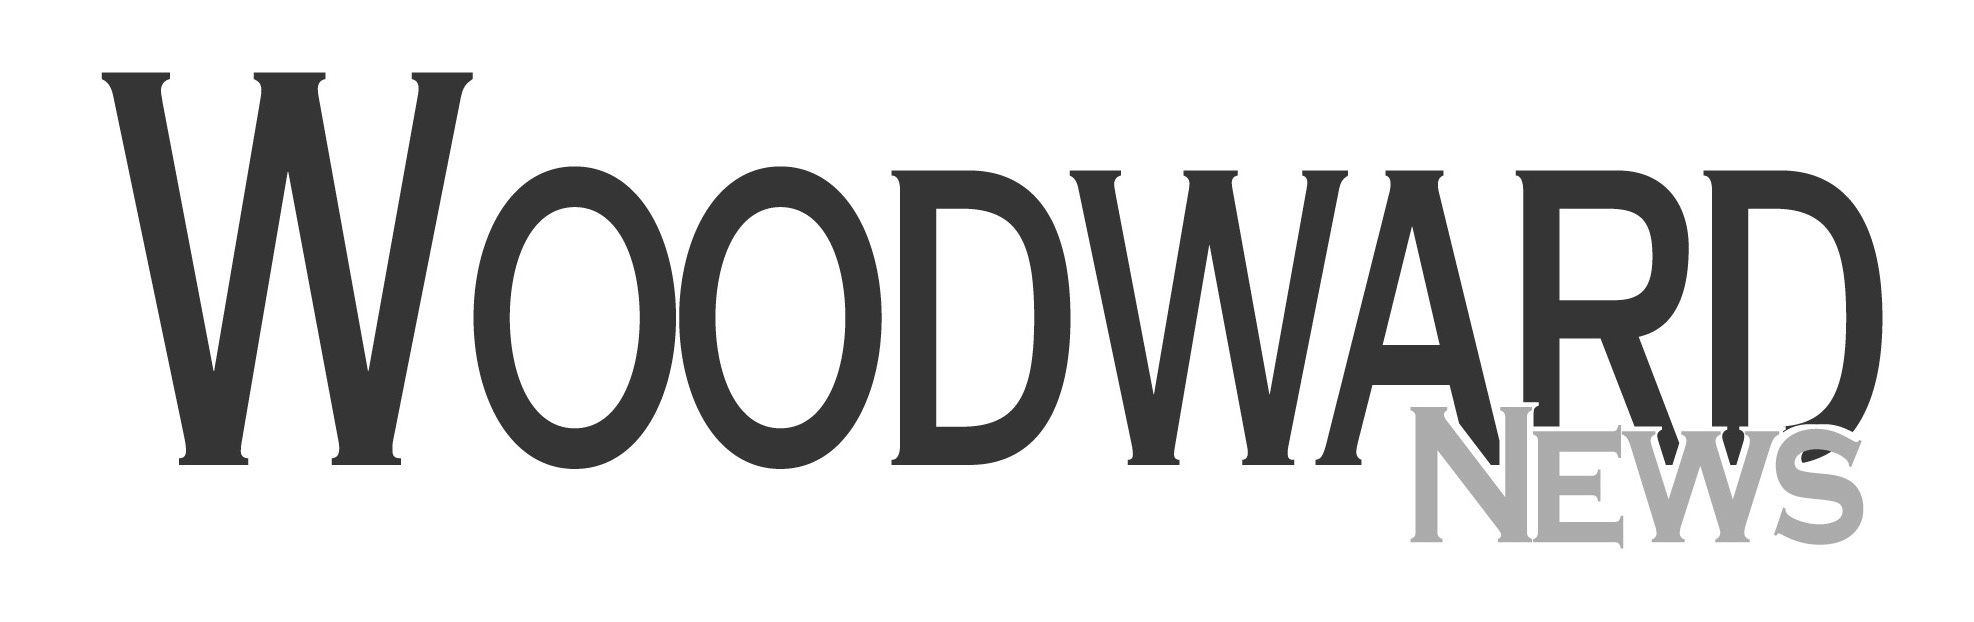 Woodward+News+copy.jpg